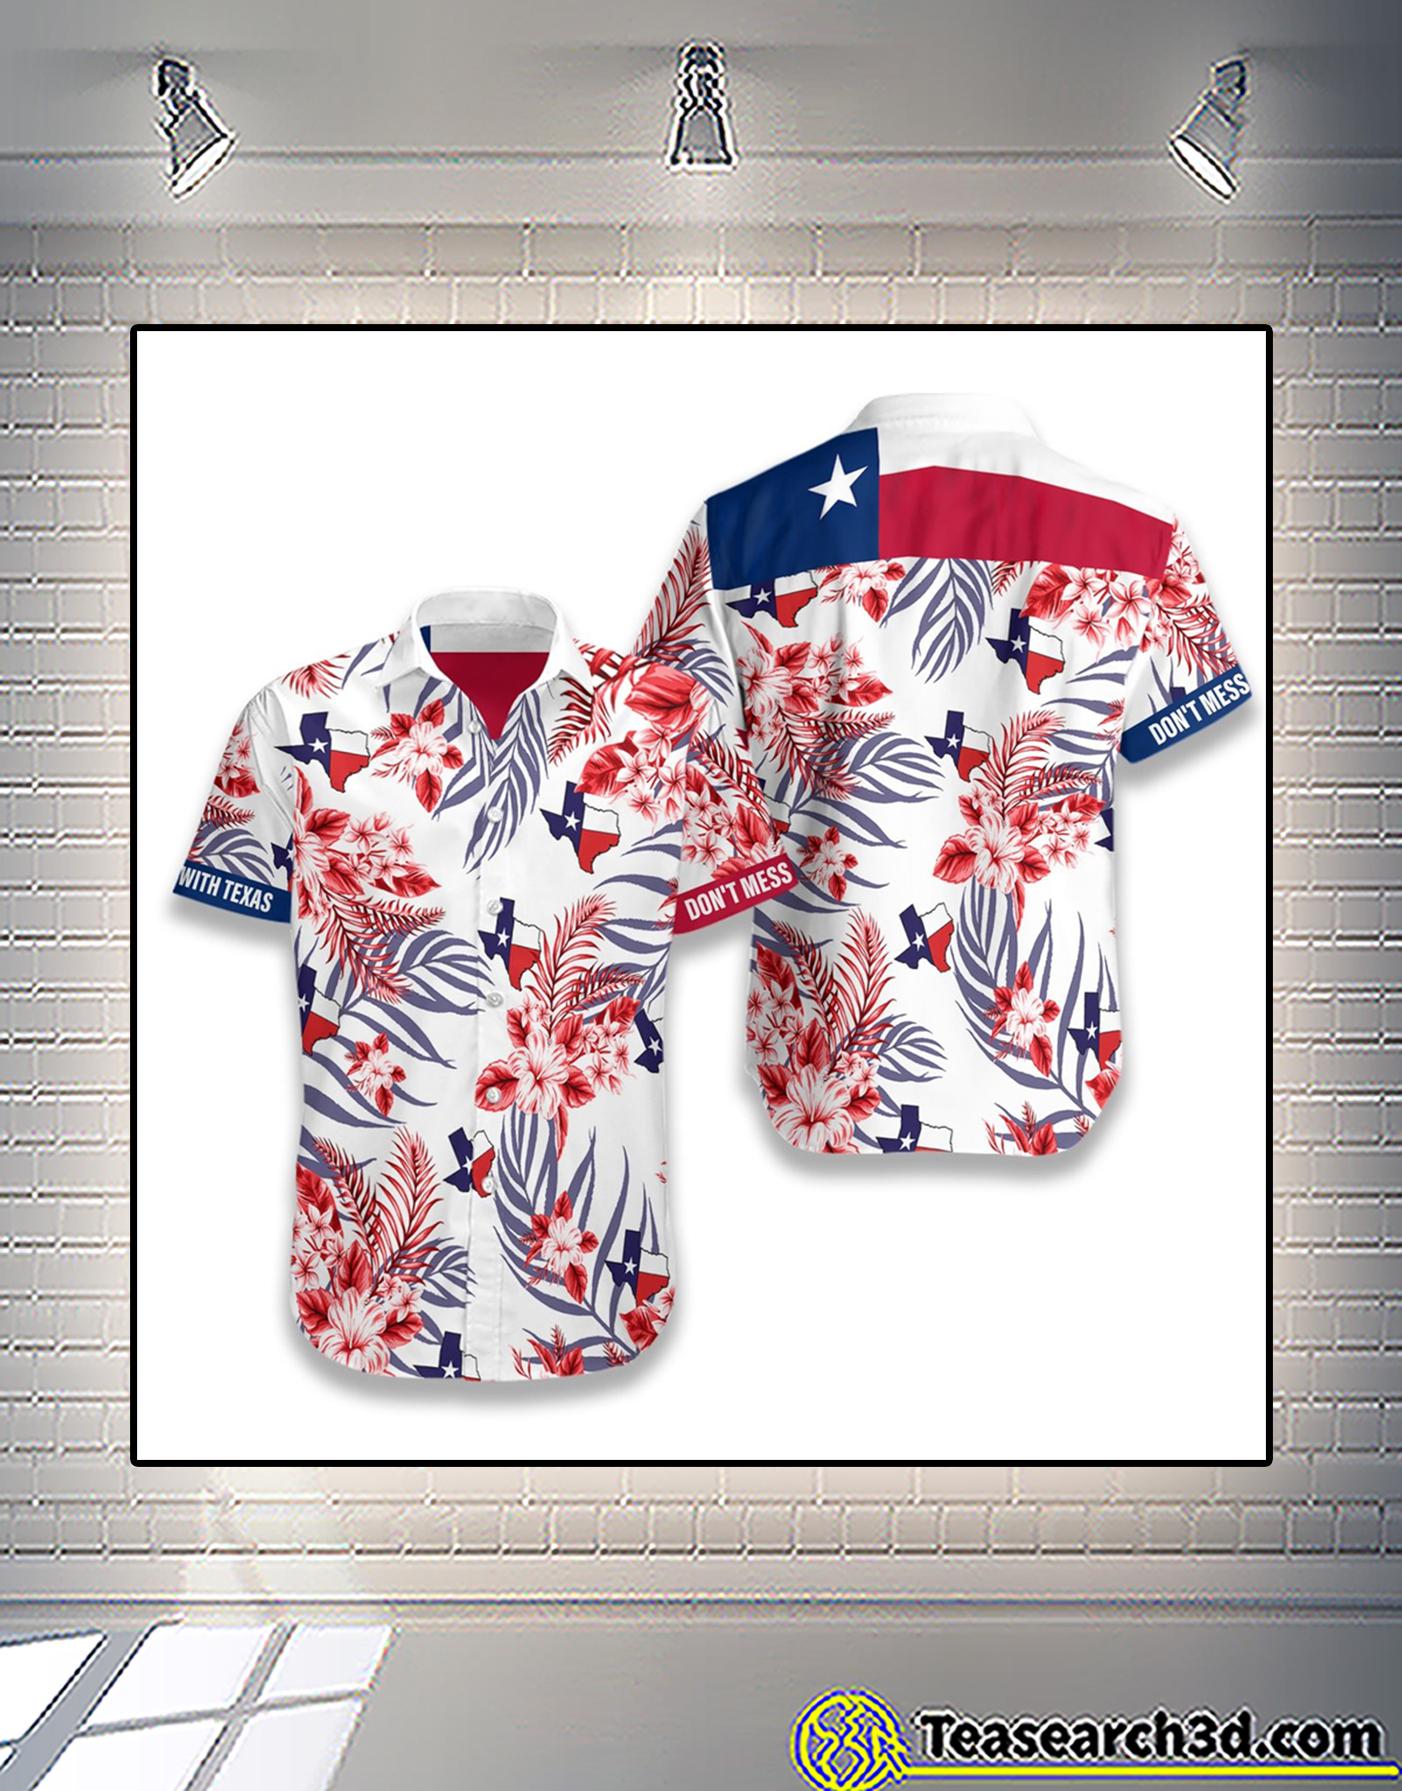 Lone star nation don't mess with texas hawaiian shirt